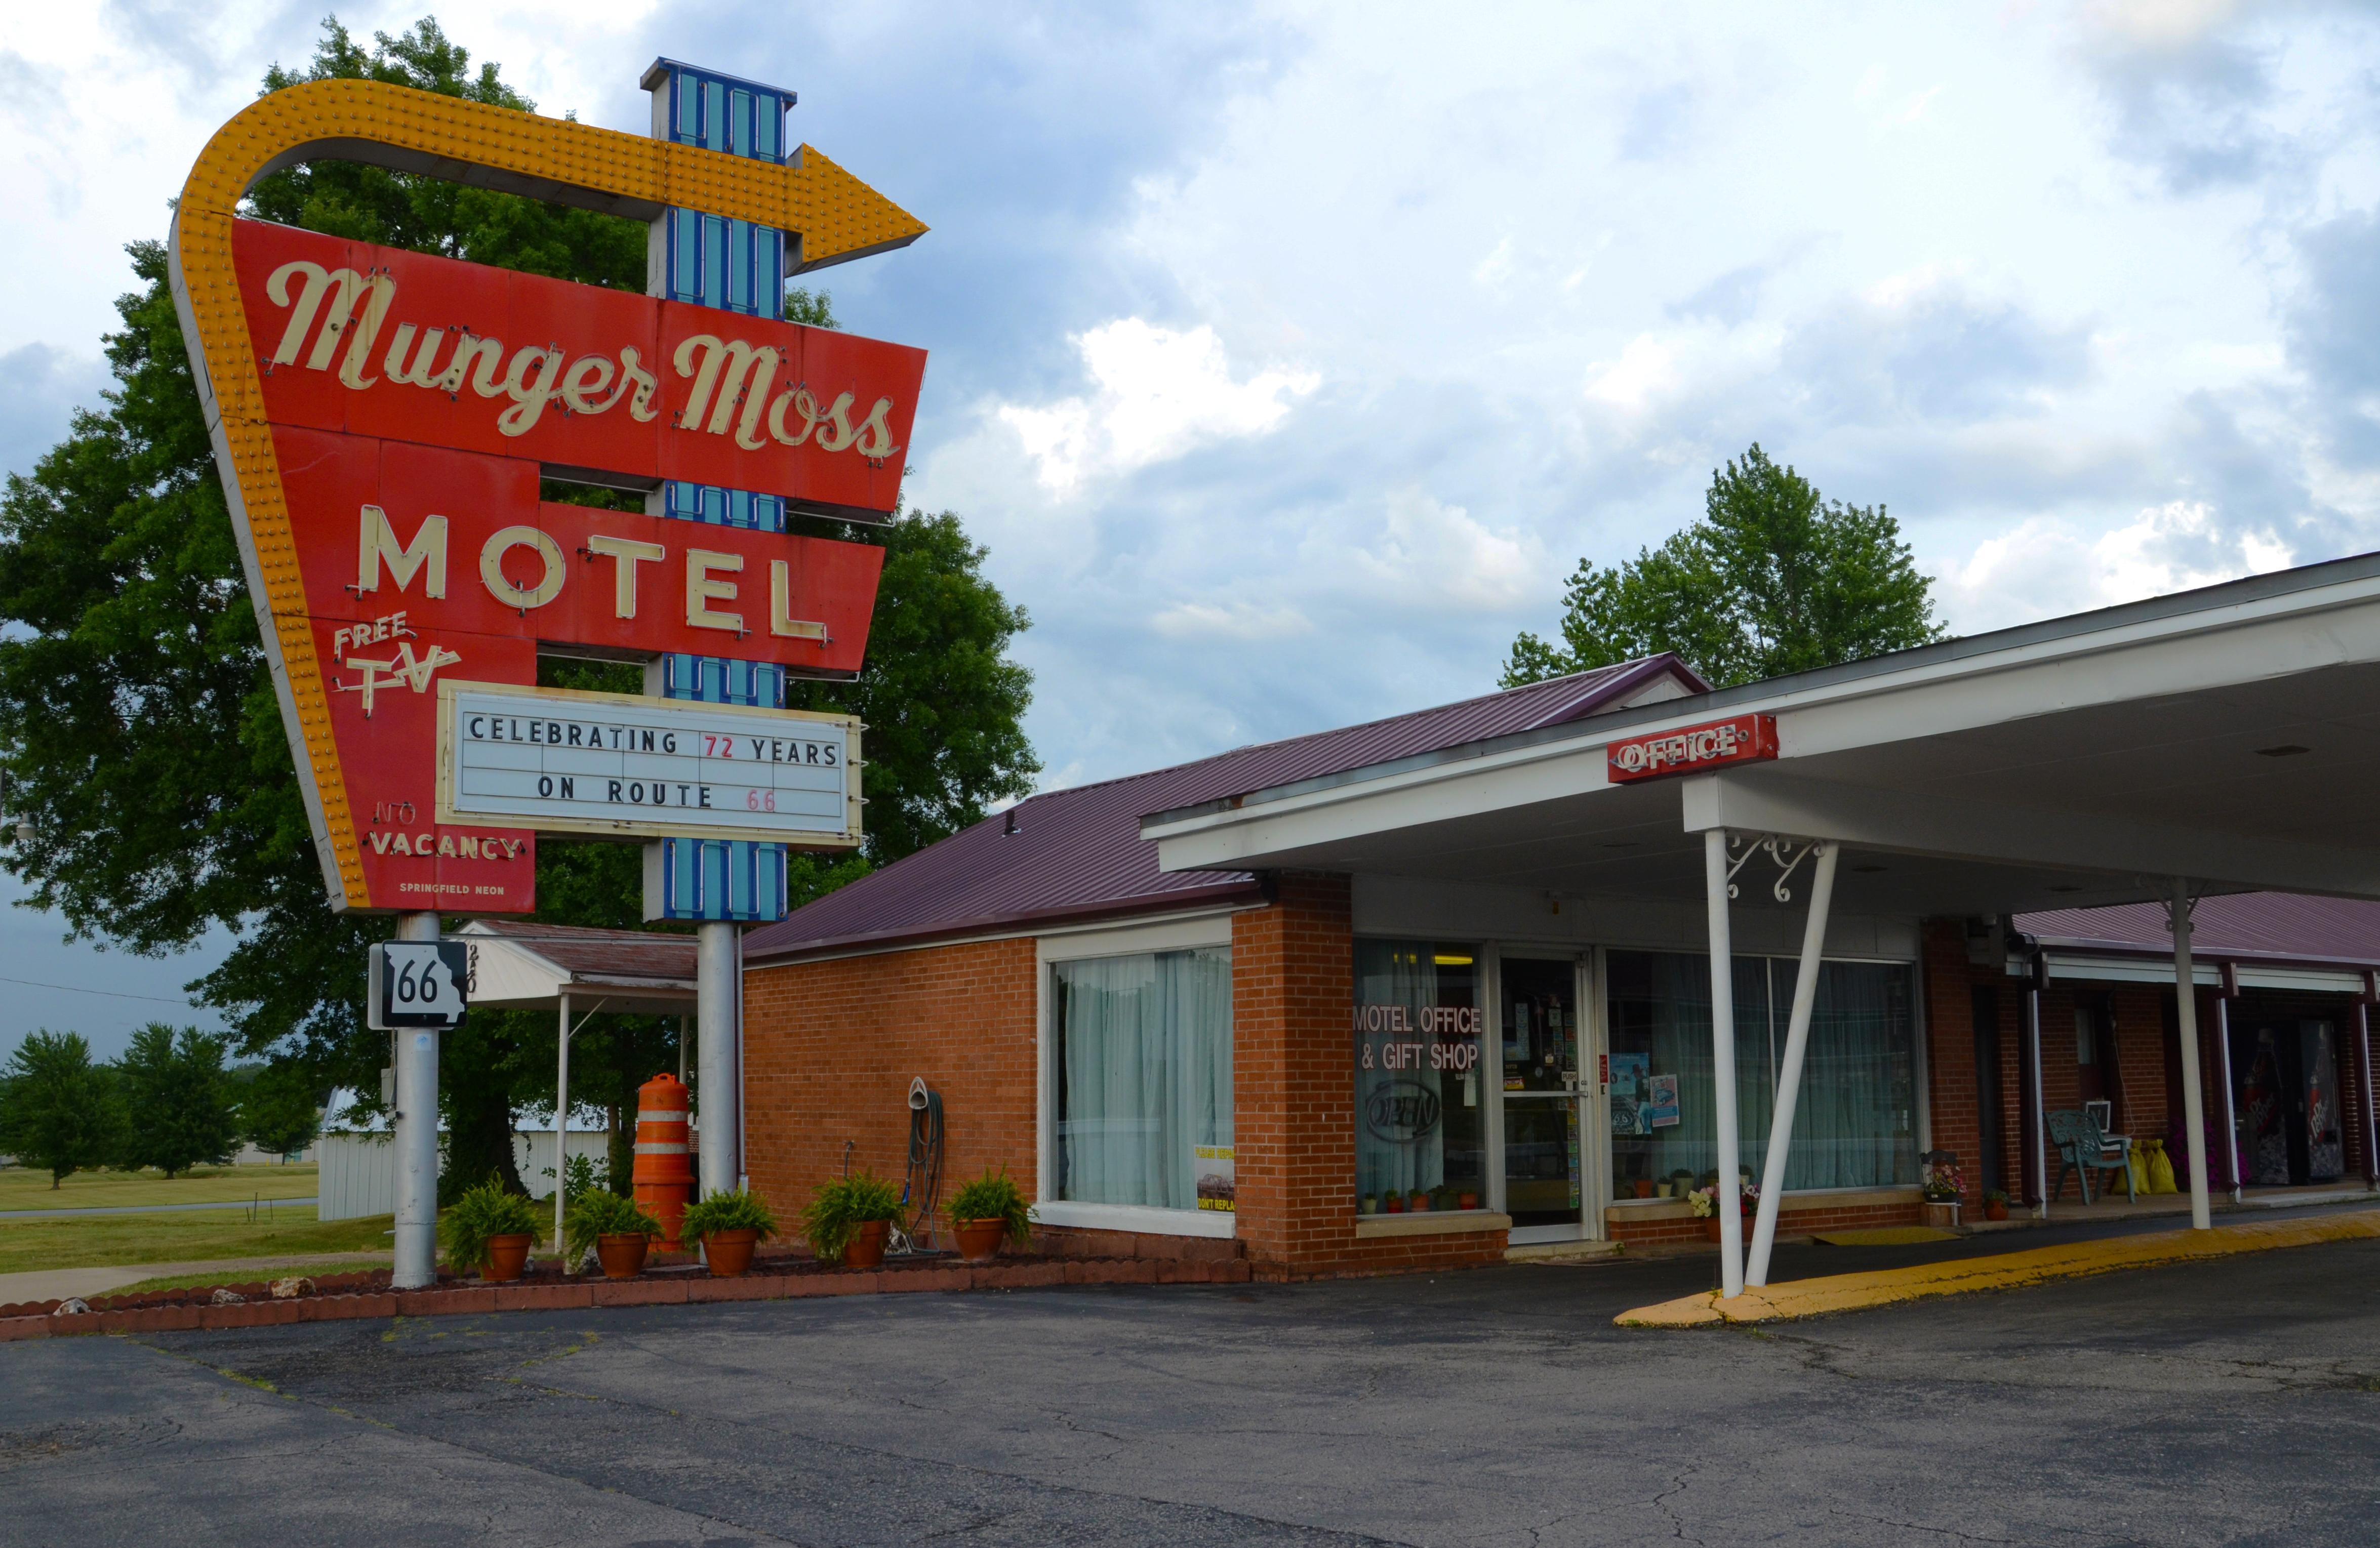 Munger Moss Motel - 1336 East Route 66, Lebanon, Missouri U.S.A. - June 19, 2018